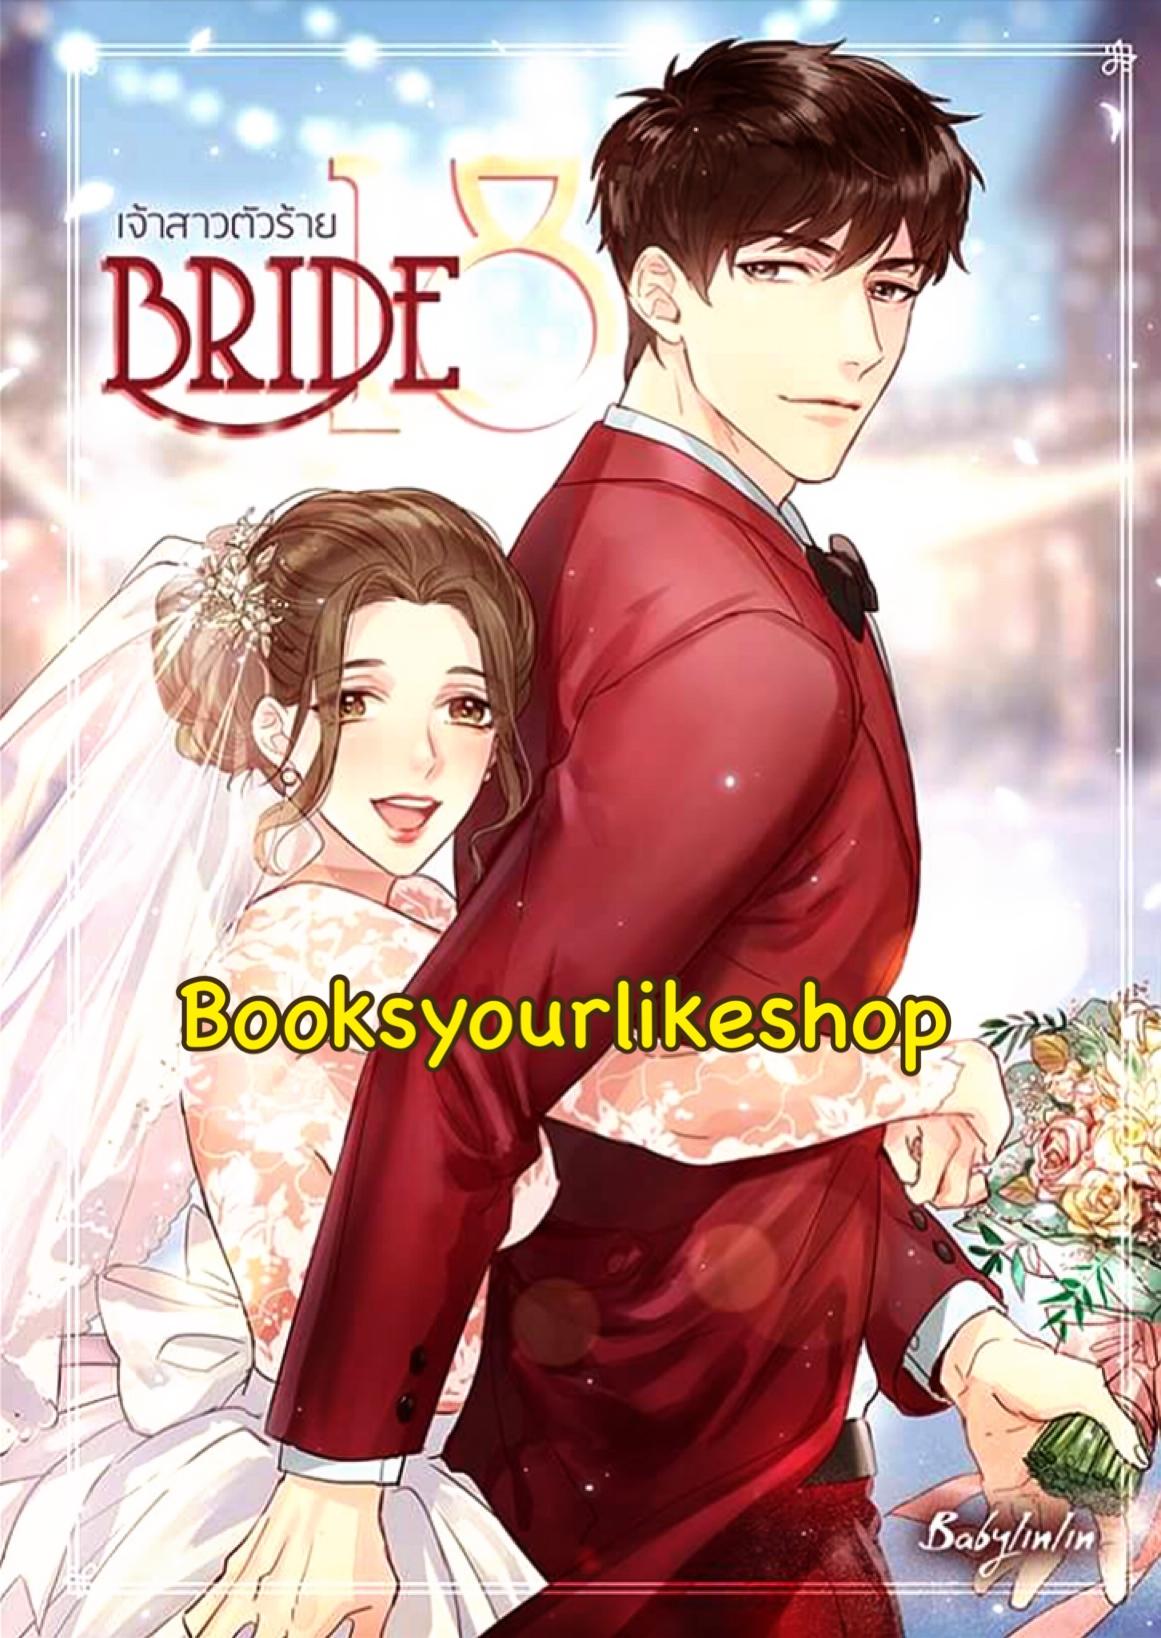 Bride 18 เจ้าสาวตัวร้าย / BabyLinLin หนังสือใหม่ทำมือ***สนุกค***